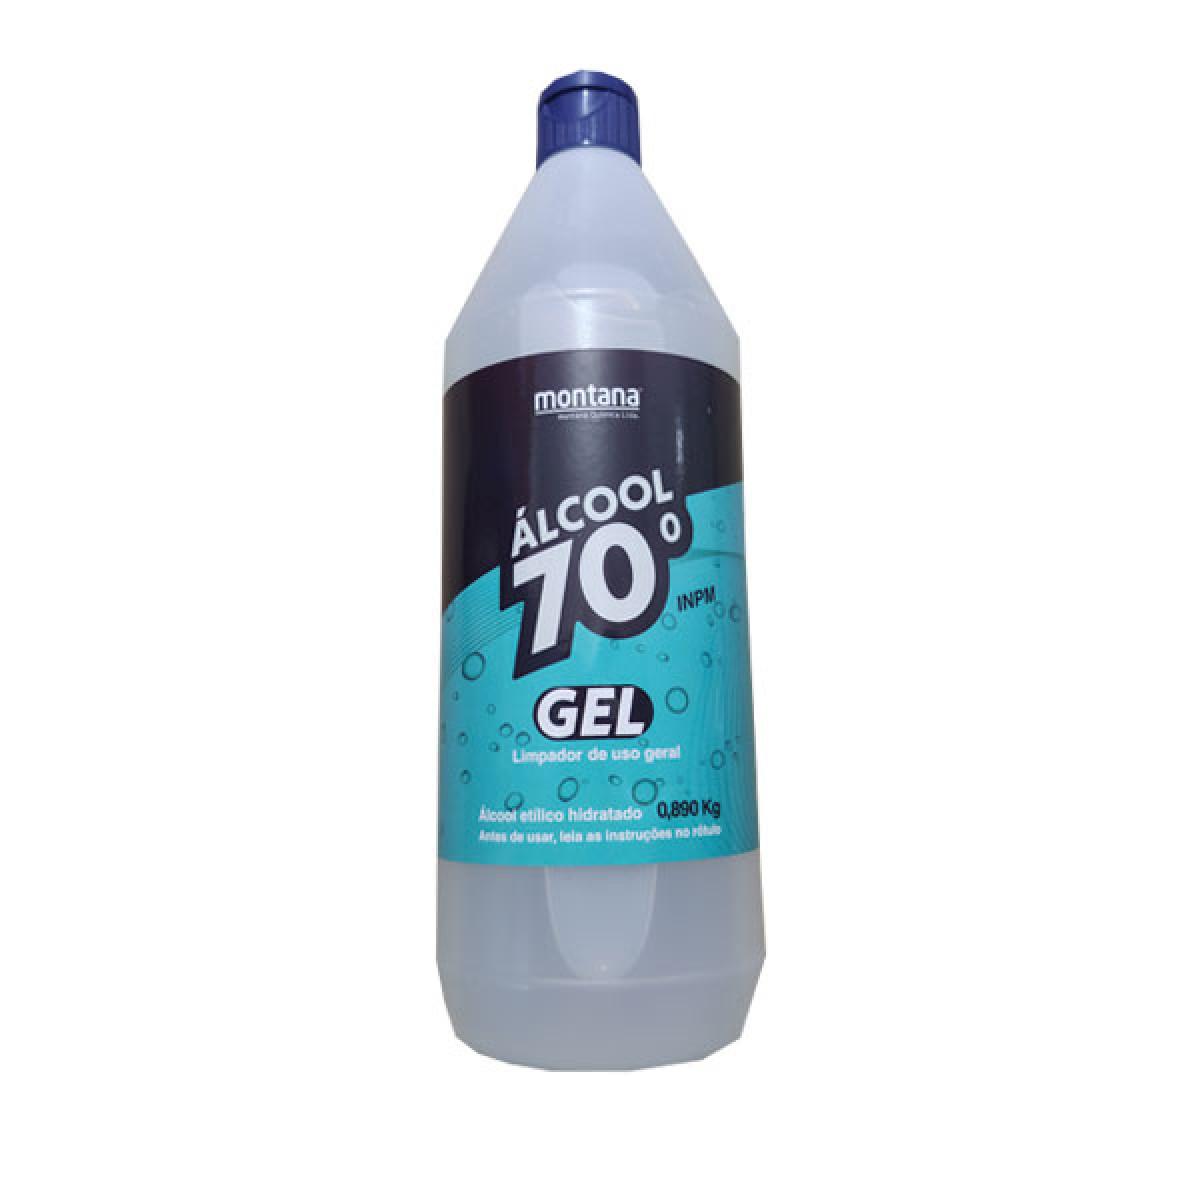 loja_soldamaq_produto_álcool gel_solução 70°_890g_Montana